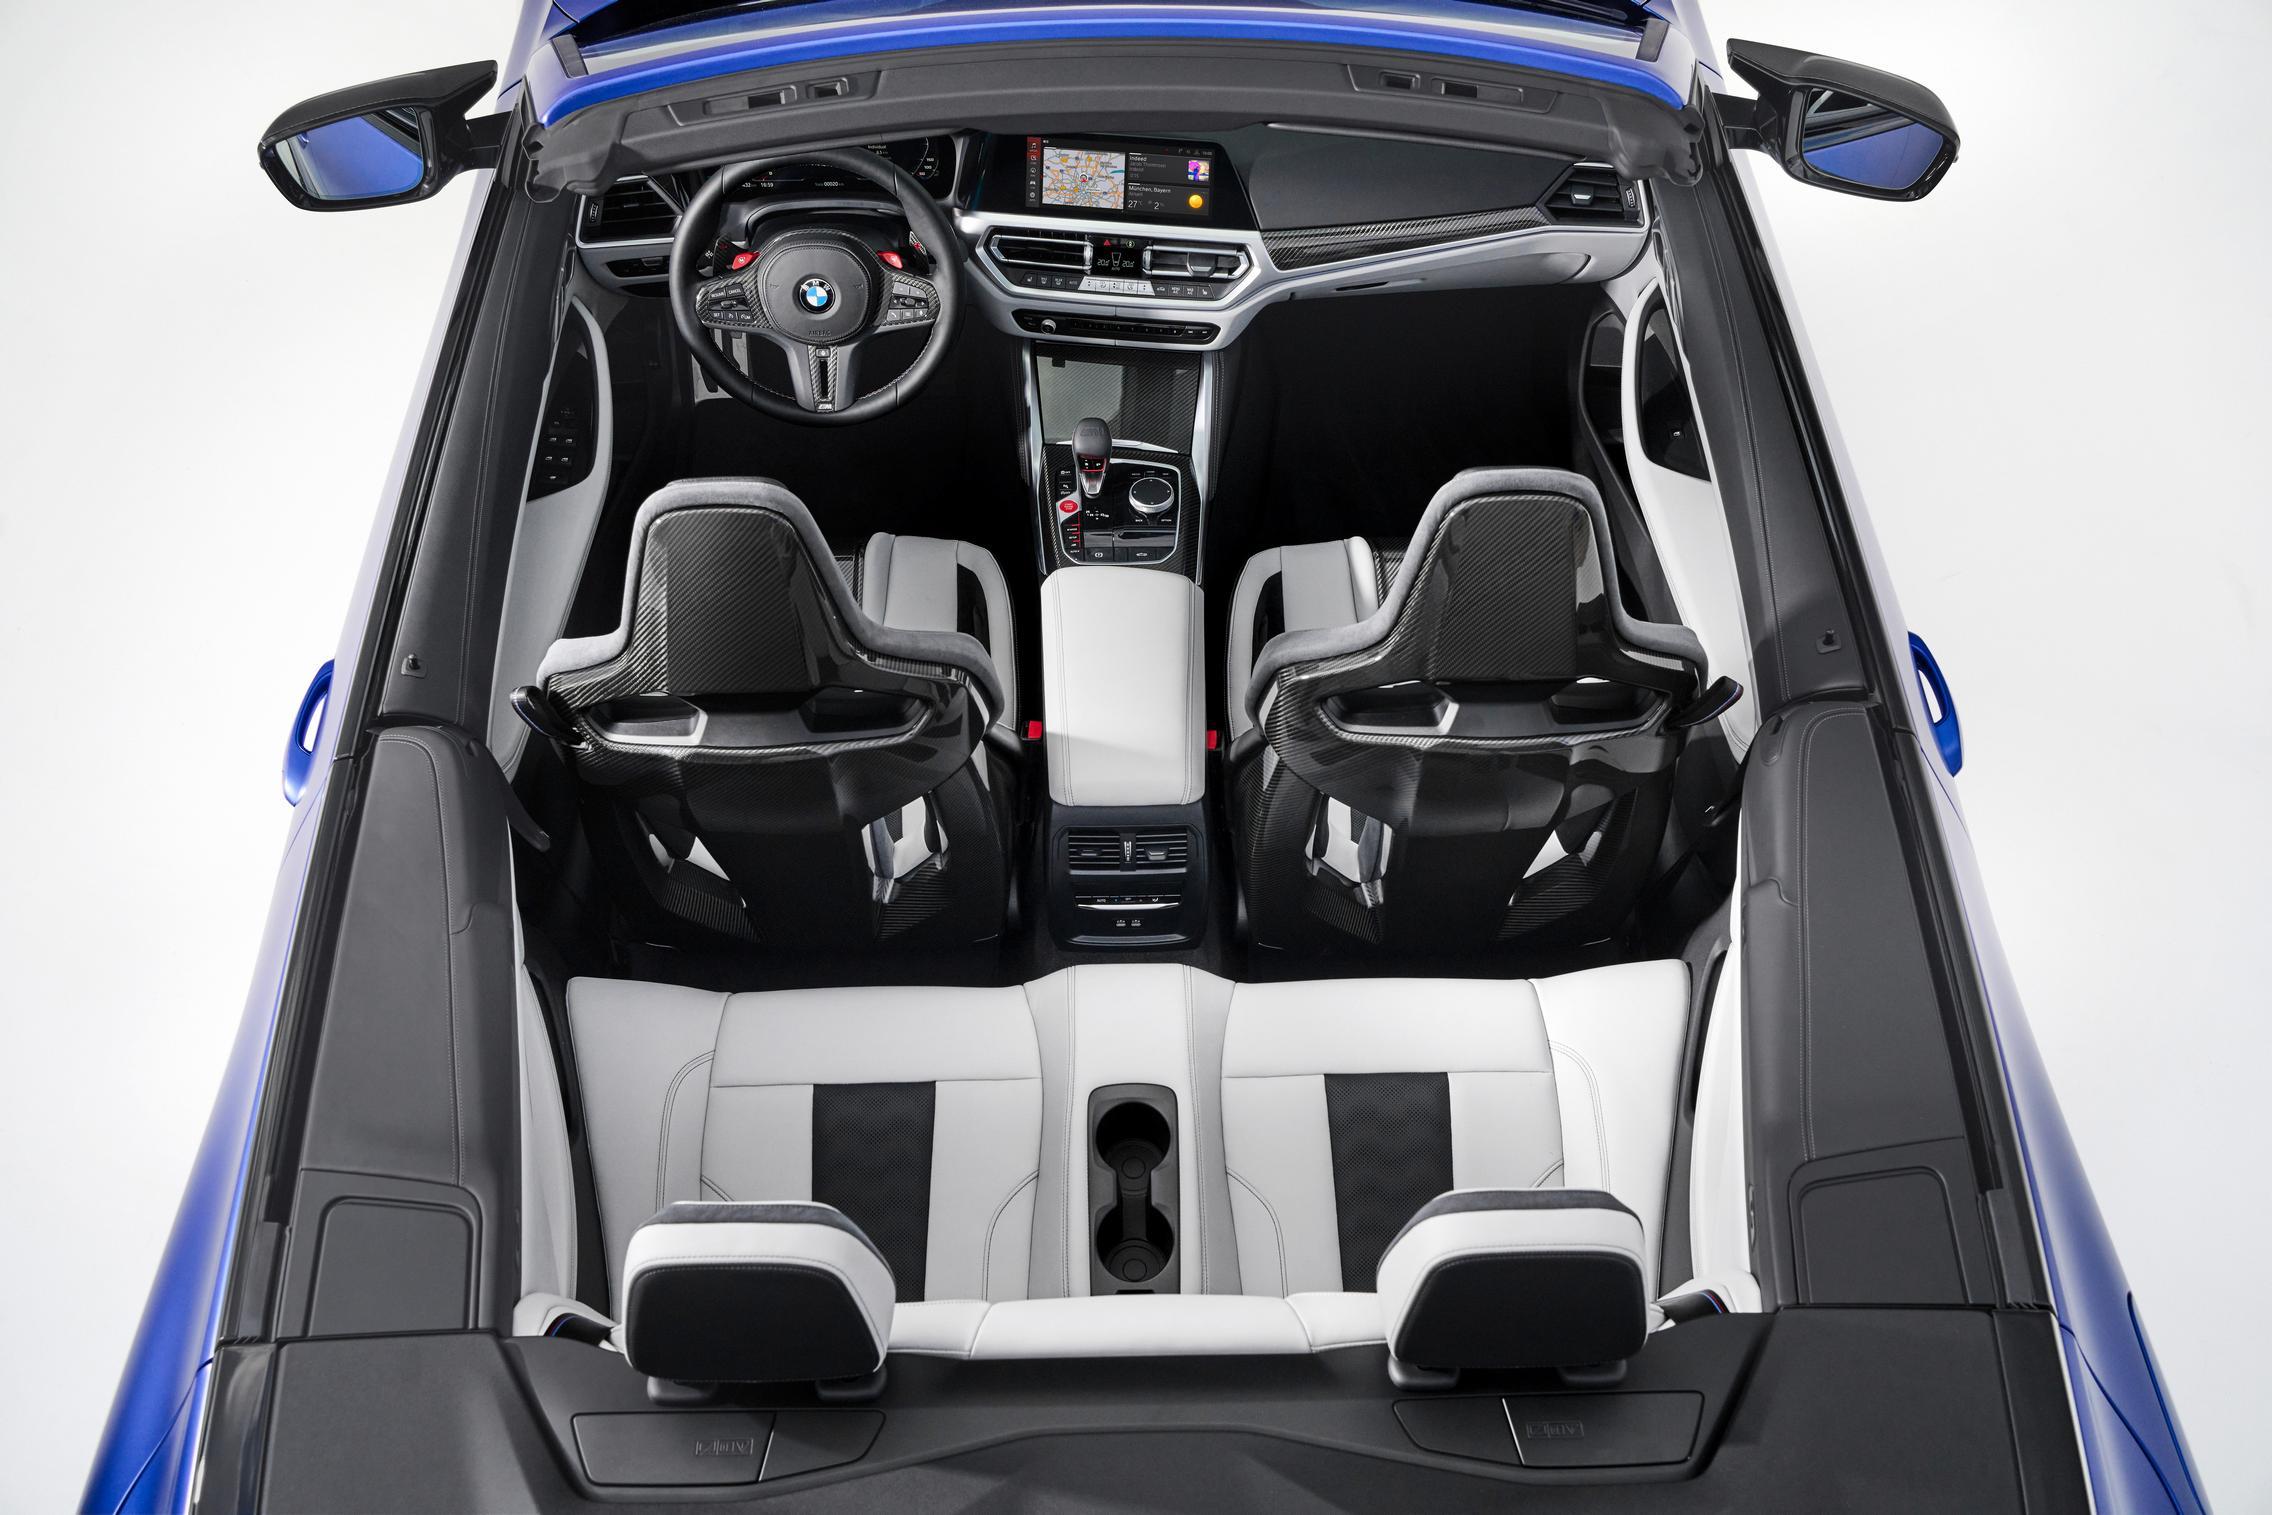 2022 BMW M4 Convertible Seats